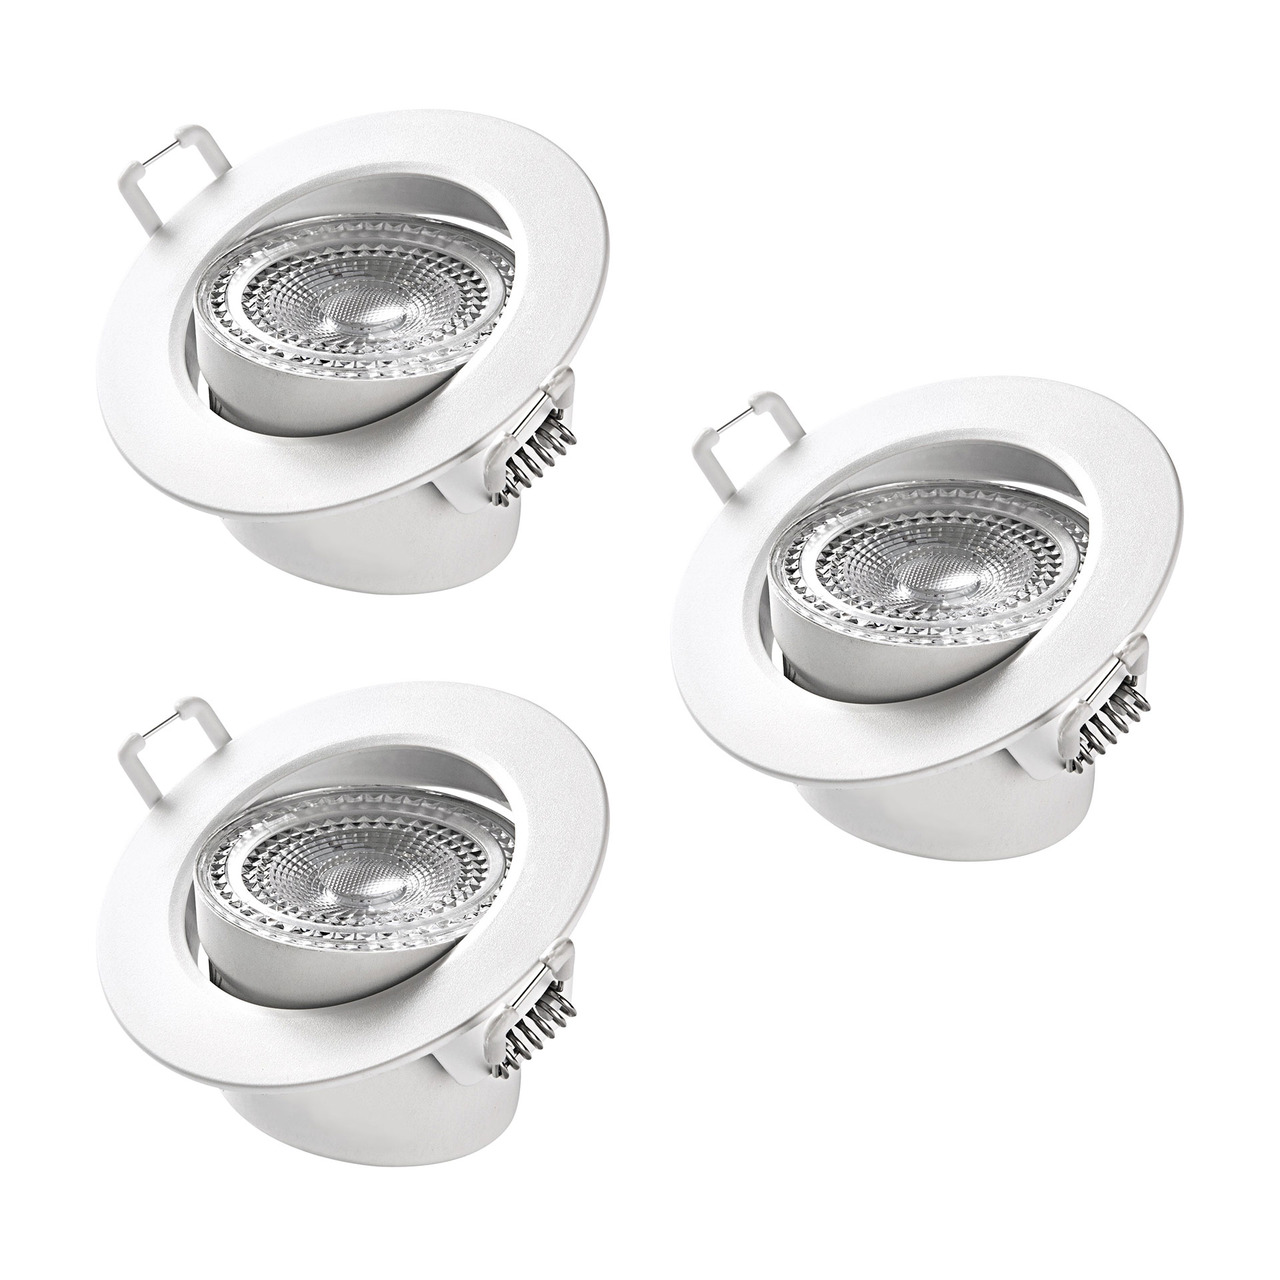 HEITRONIC 3er-Spar-Set - 5-5-W-LED-Einbaustrahler DL7002- austauschbare Kunststoffringe- schwenkbar